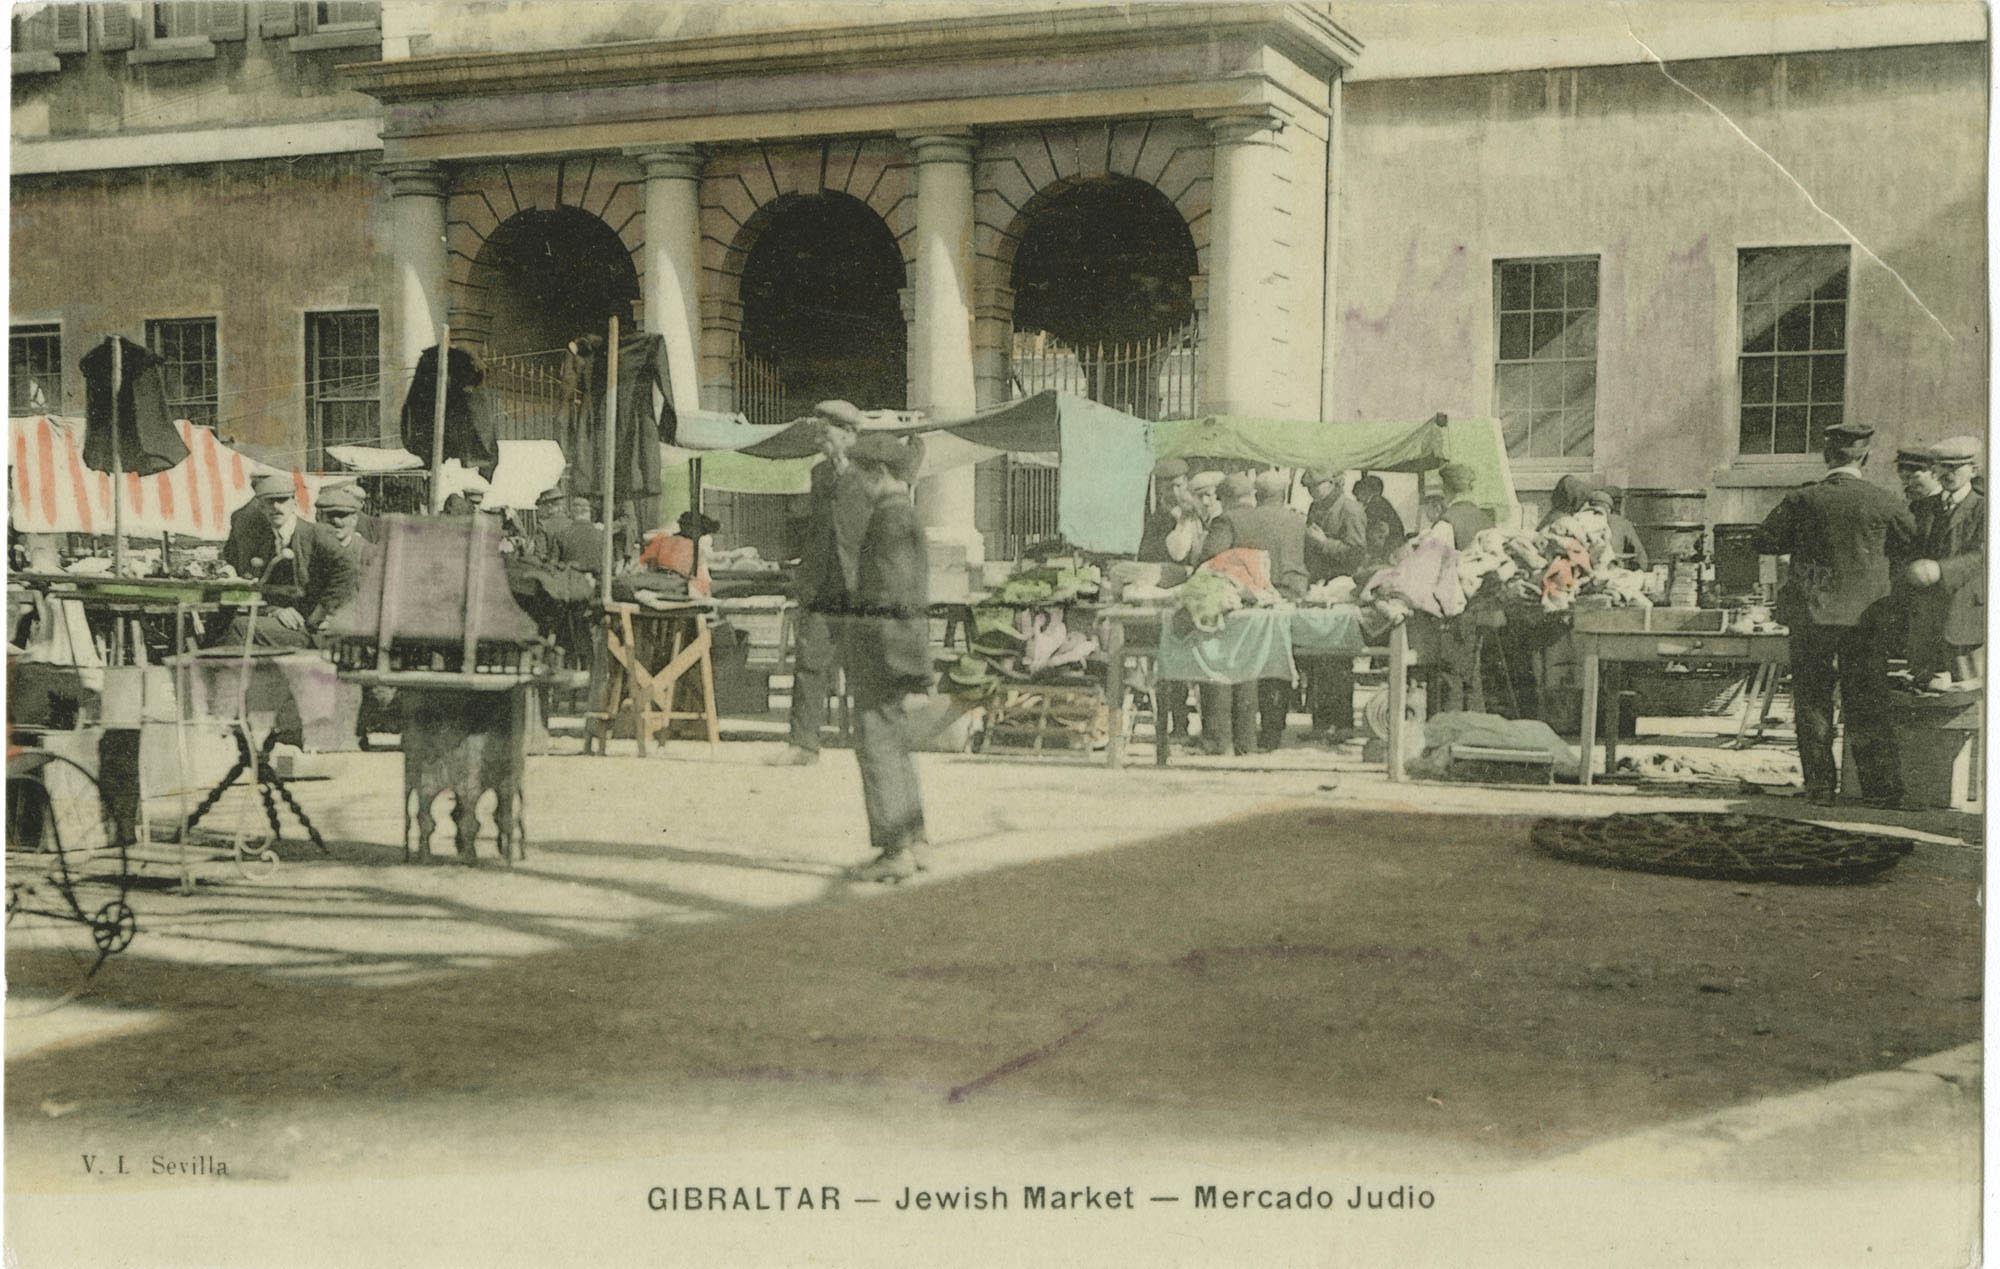 GIBRALTAR. Jewish Market / Mercado Judio